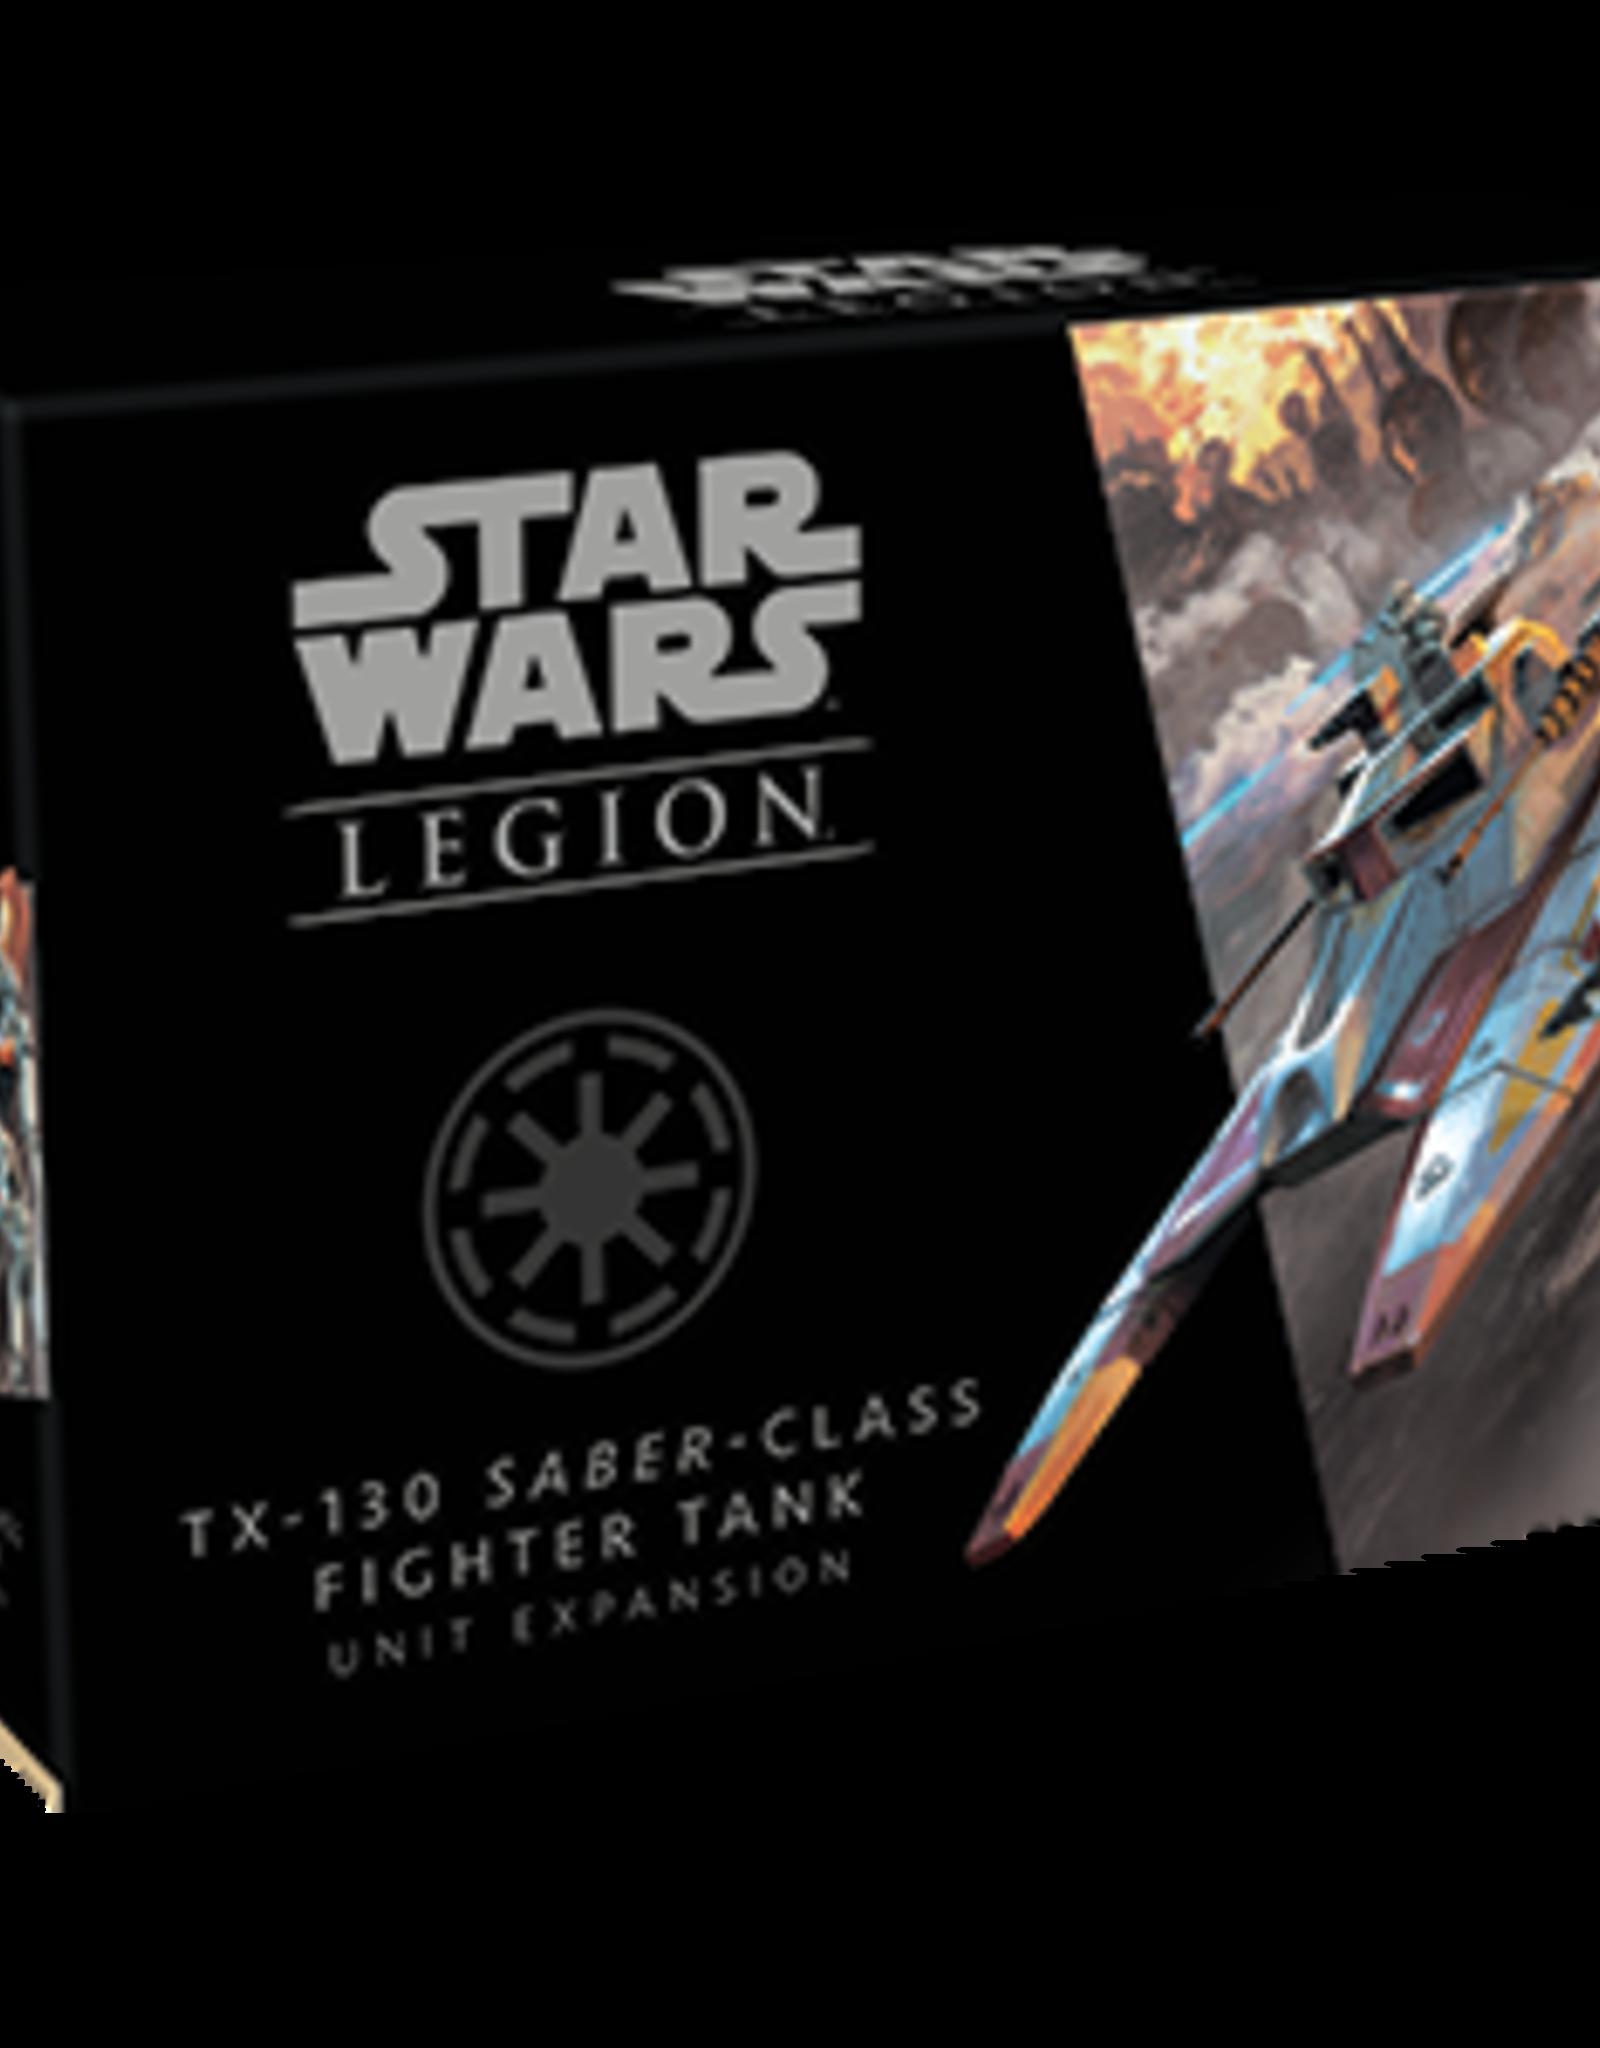 FFG Star Wars: Legion - TX-130 Saber-class Fighter Tank Unit Expansion